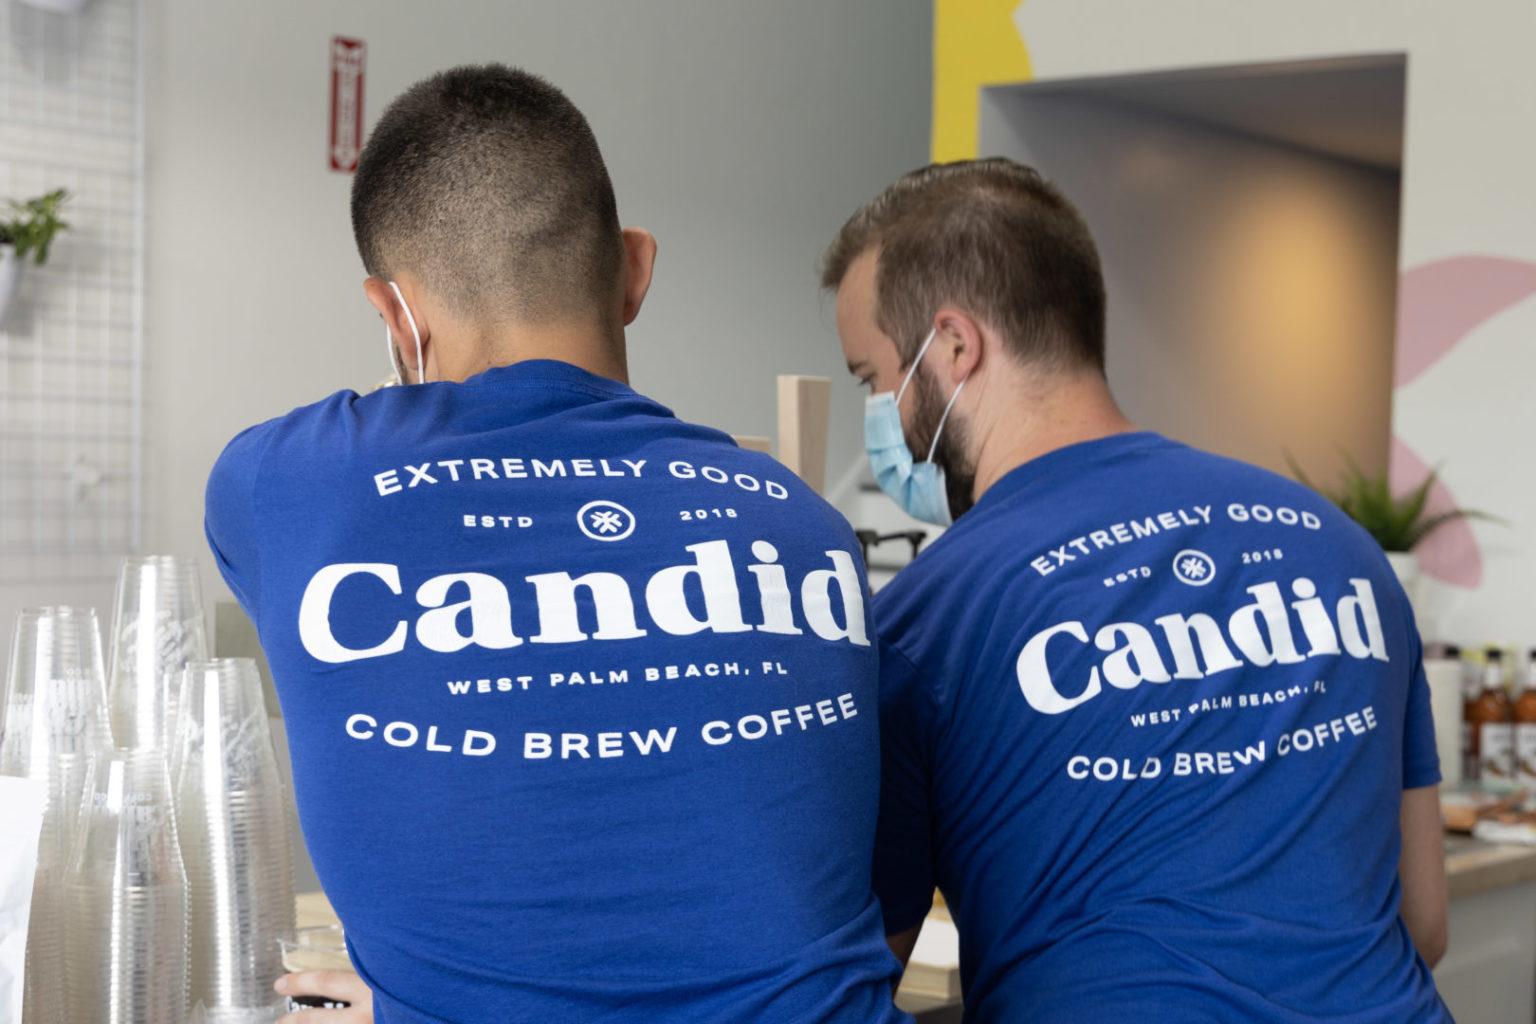 Back of Candid Tshirt